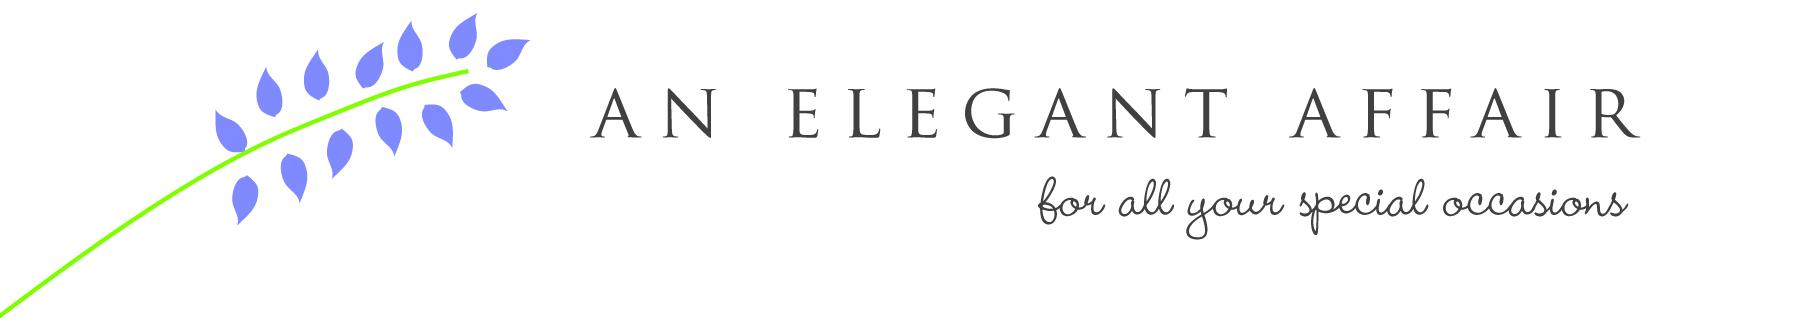 AEA Web Site Banner